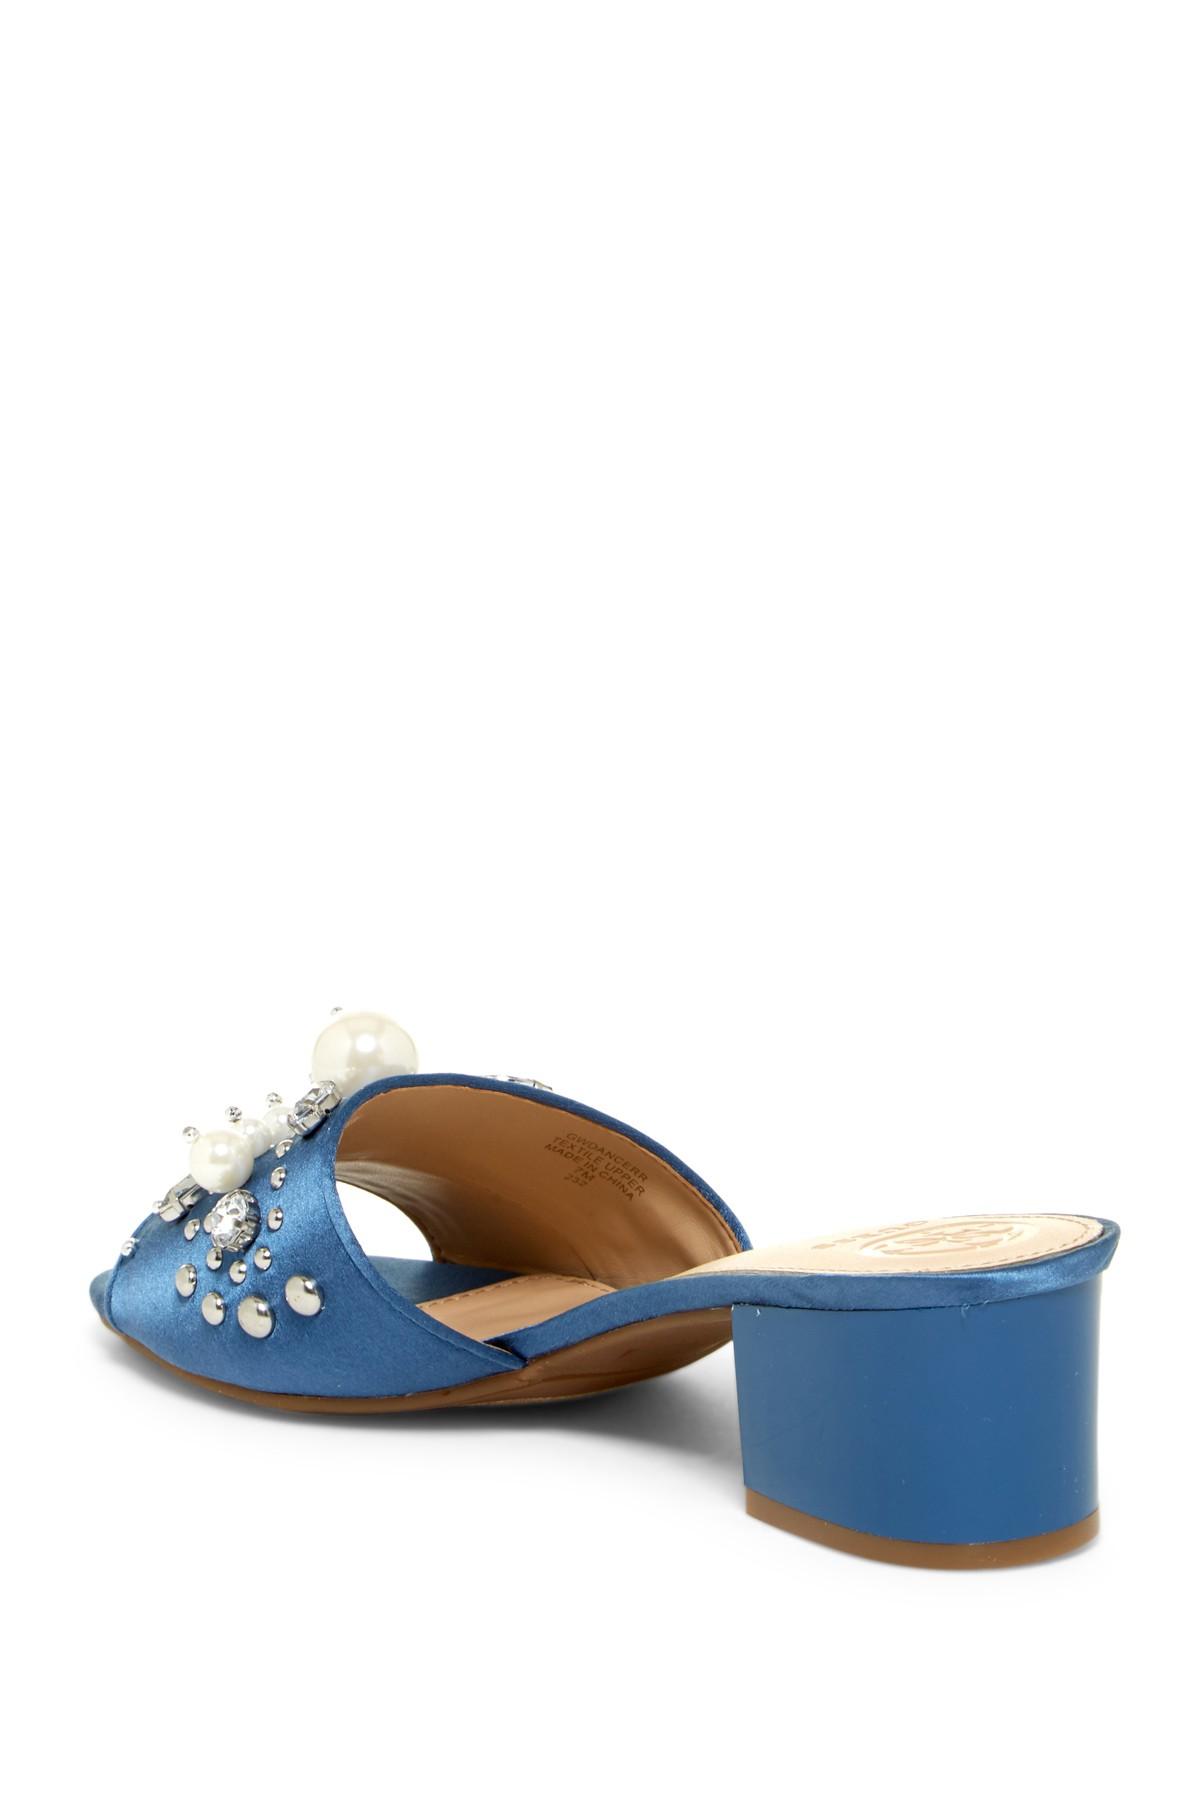 GUESS mujer Dancerr Dancerr Dancerr Fabric Open Toe Casual Slide Sandals  Más asequible